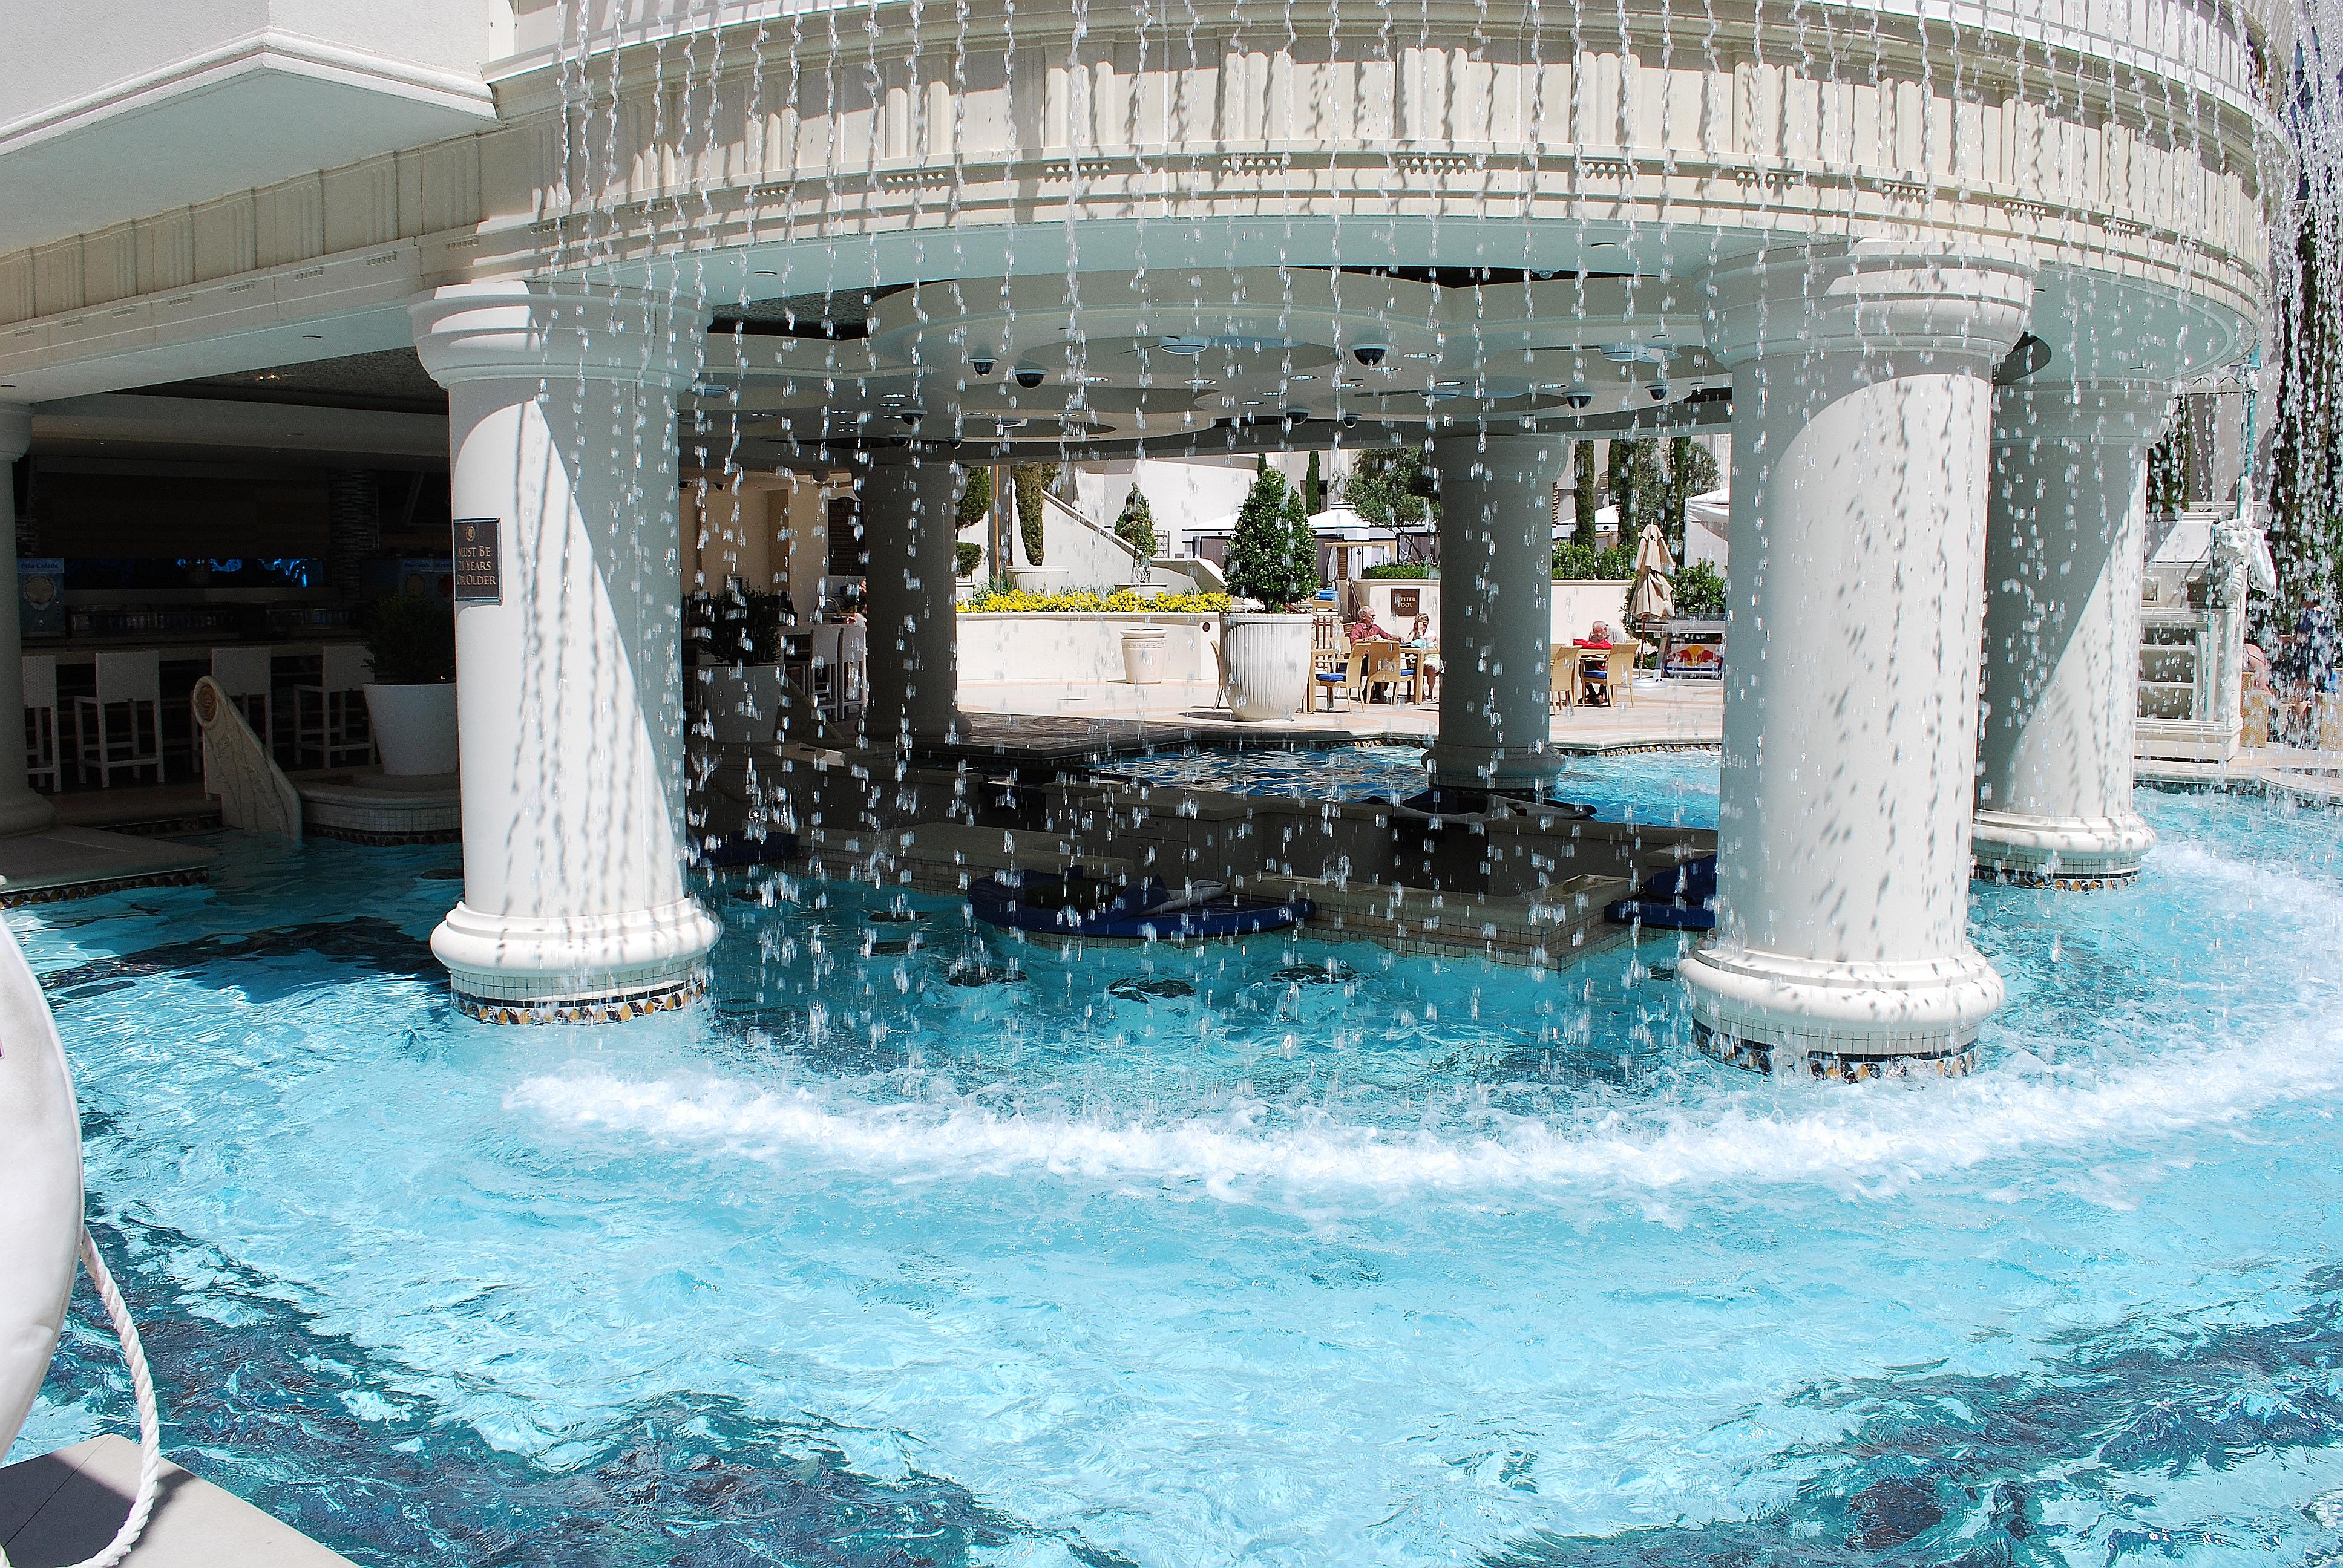 Caesars palace las vegas pool flickr photo sharing for Caesars swimming pool